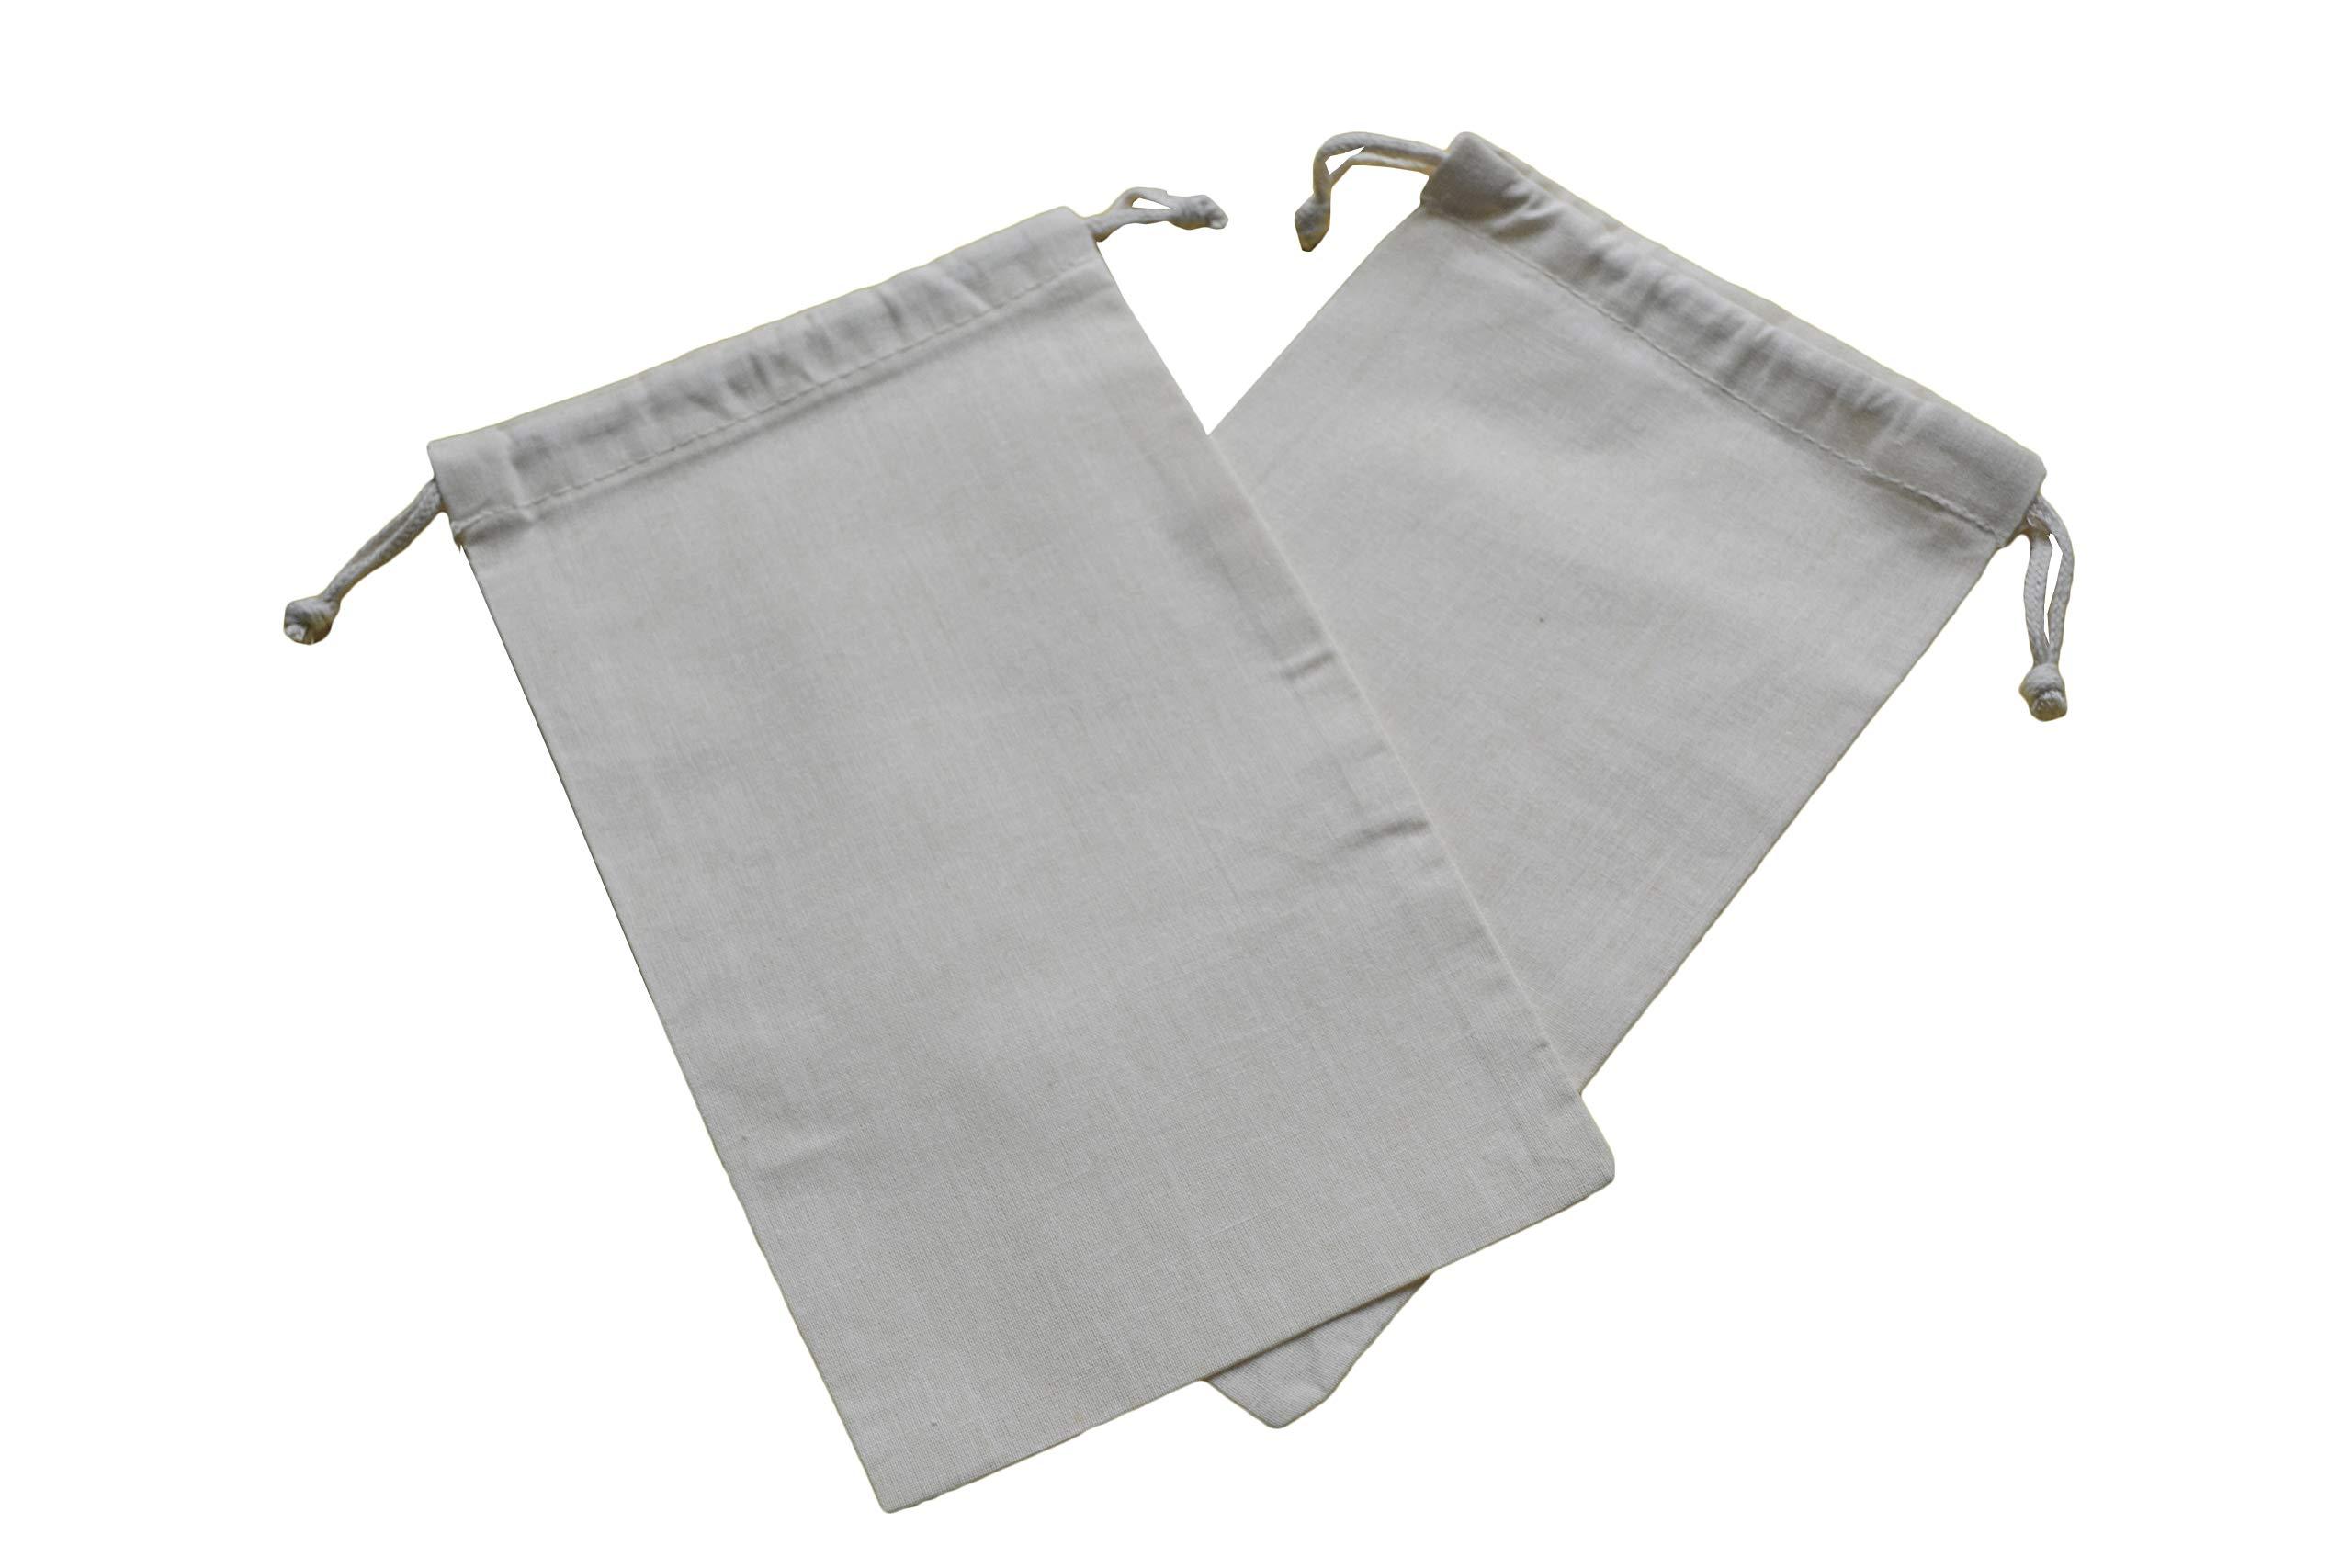 Loosewarp 50pcs 8'' x 12'' Natural Muslin Double Drawstring Bag - Wedding Favor - Party Favor - Reuseable Bags